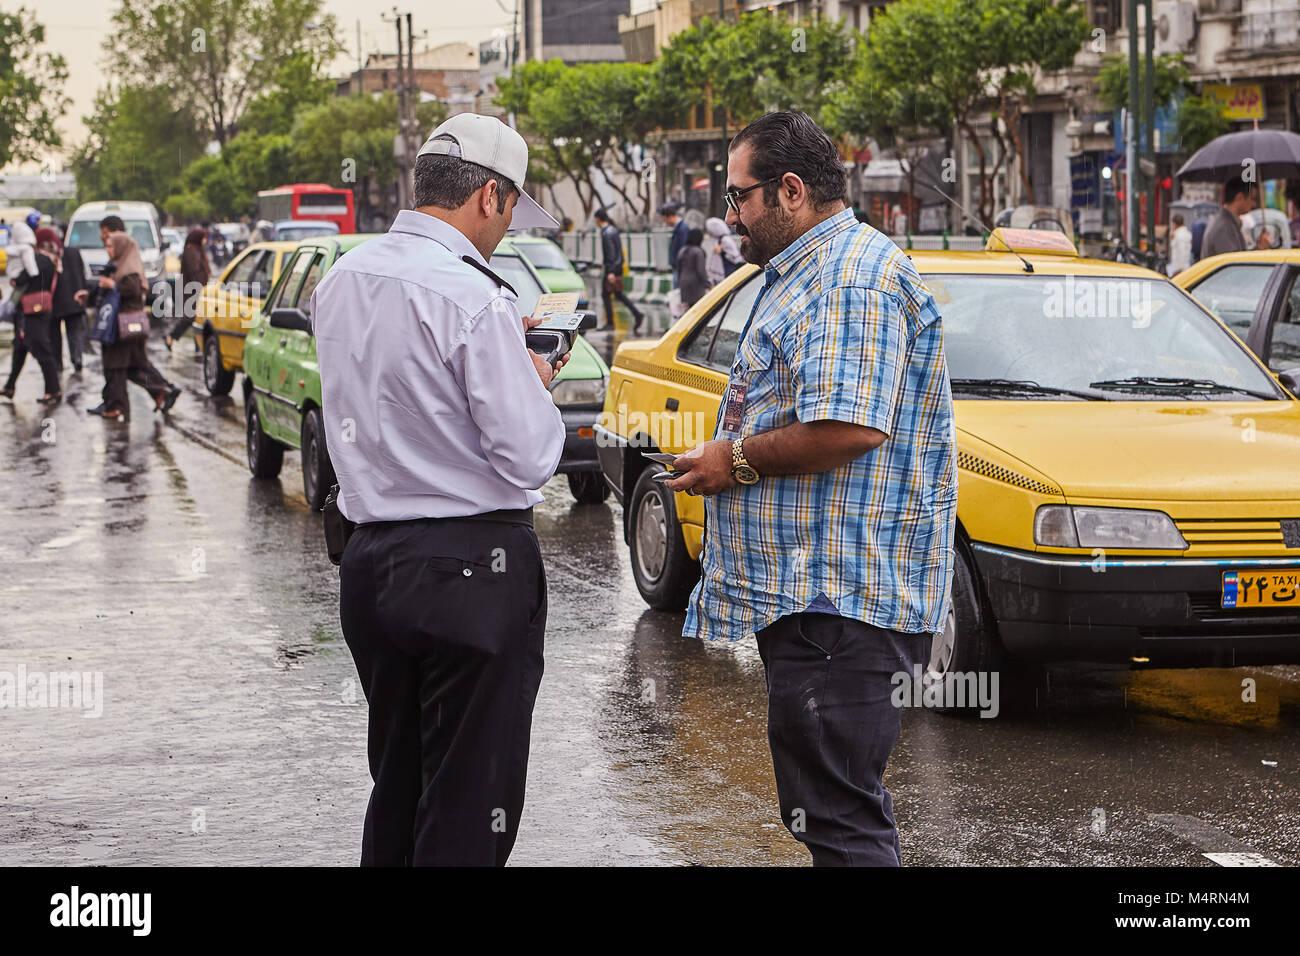 Tehran, Iran - April 29, 2017: Iranian policeman on the street checks driver's driver's license. - Stock Image